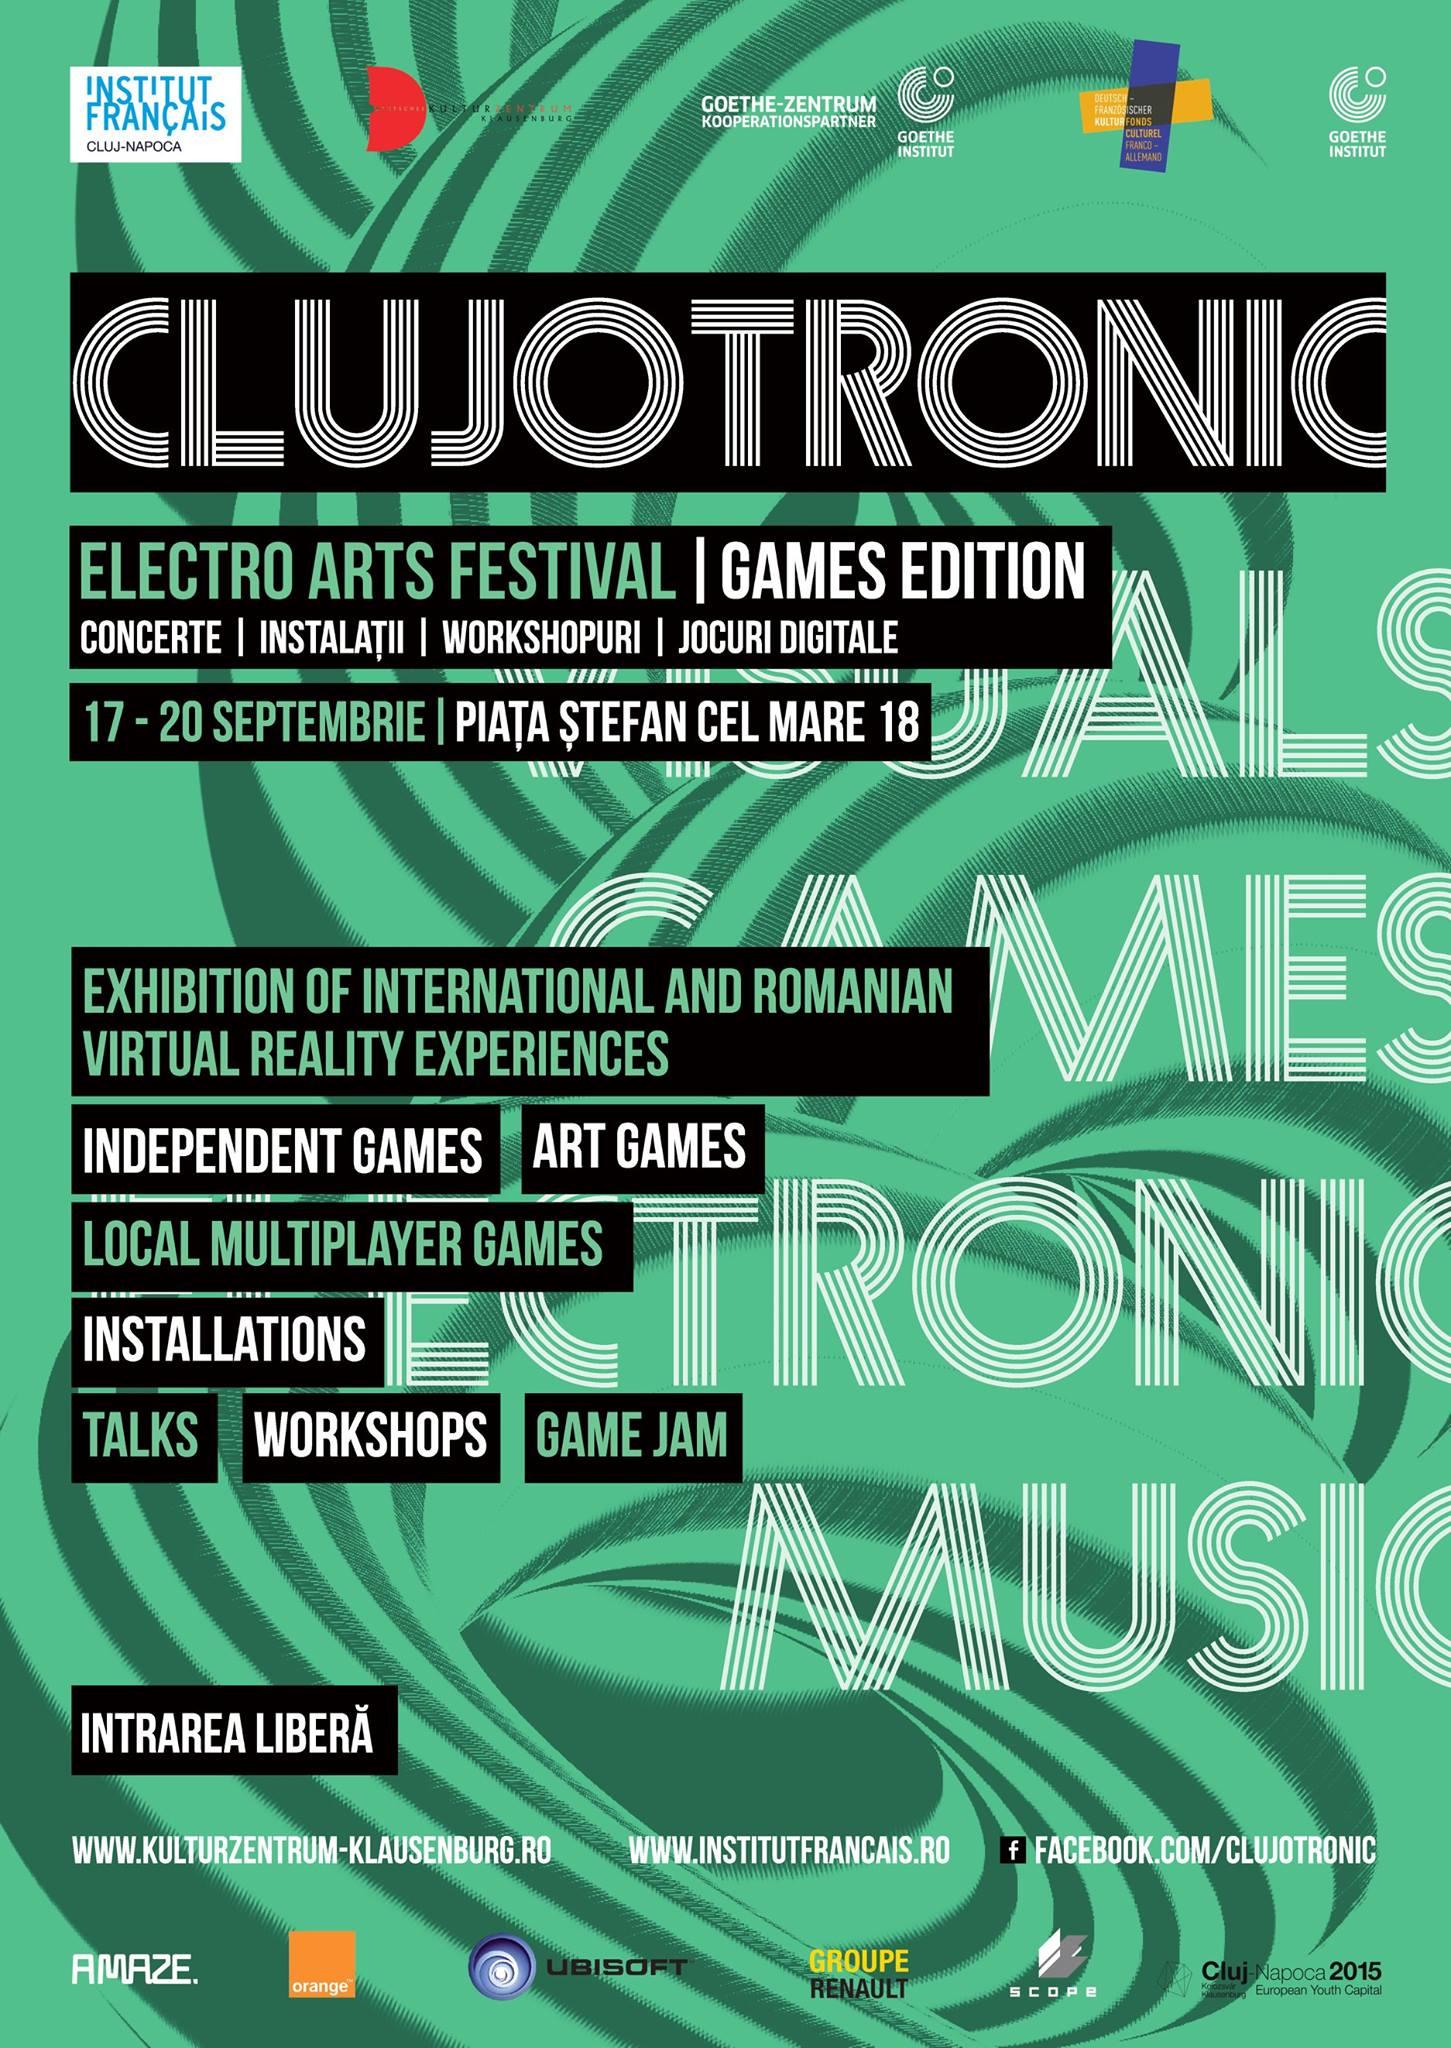 CLUJOTRONIC – Electro Arts Festival 2015